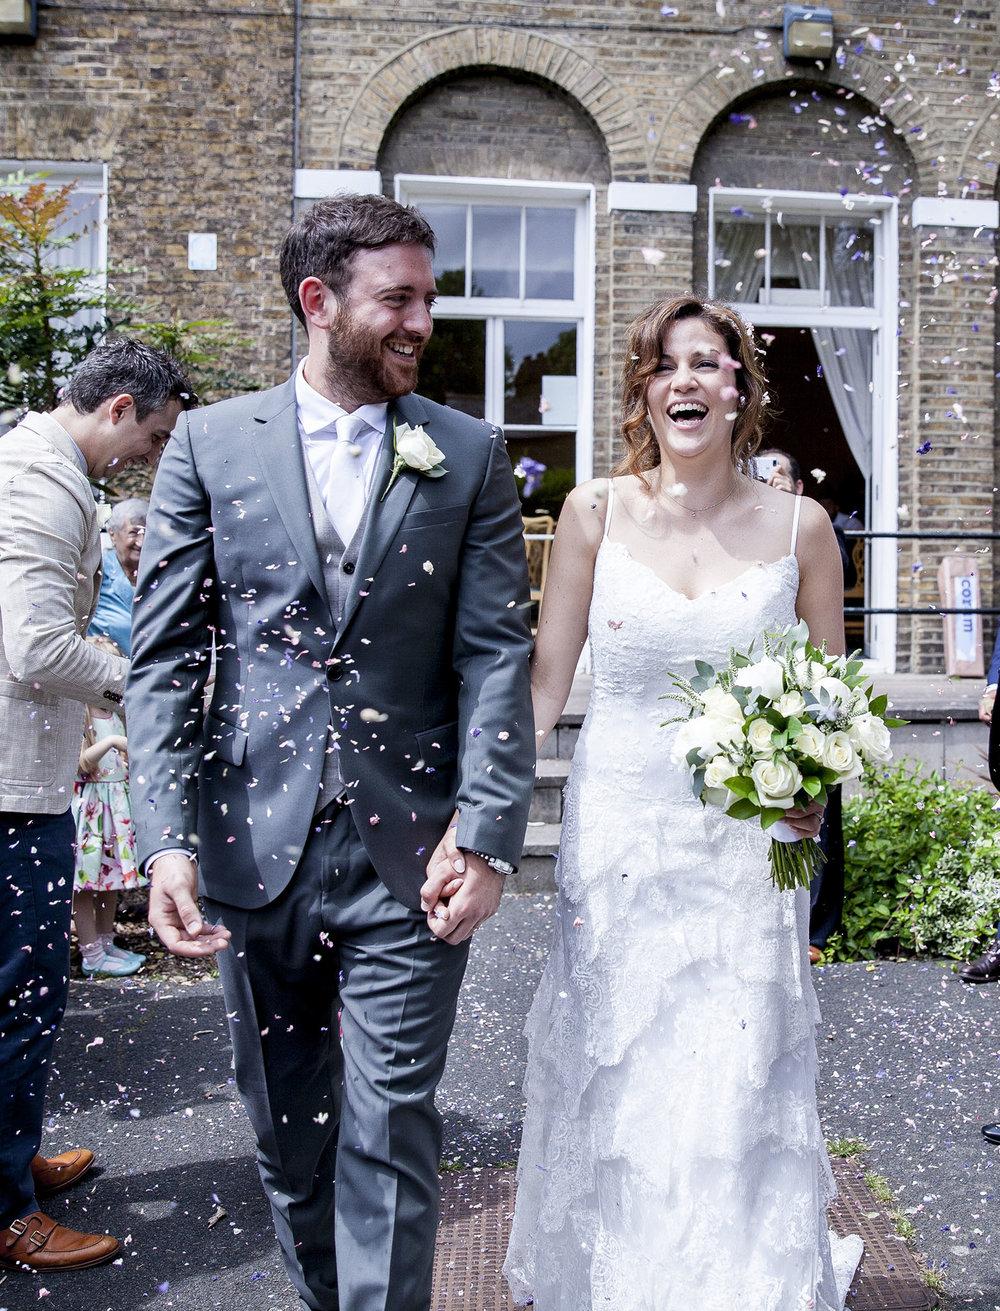 elizabethgphotography_kingslangley_hertfordshire_fineart_wedding_enfield_ricky_nicole_nahlis_24.jpg